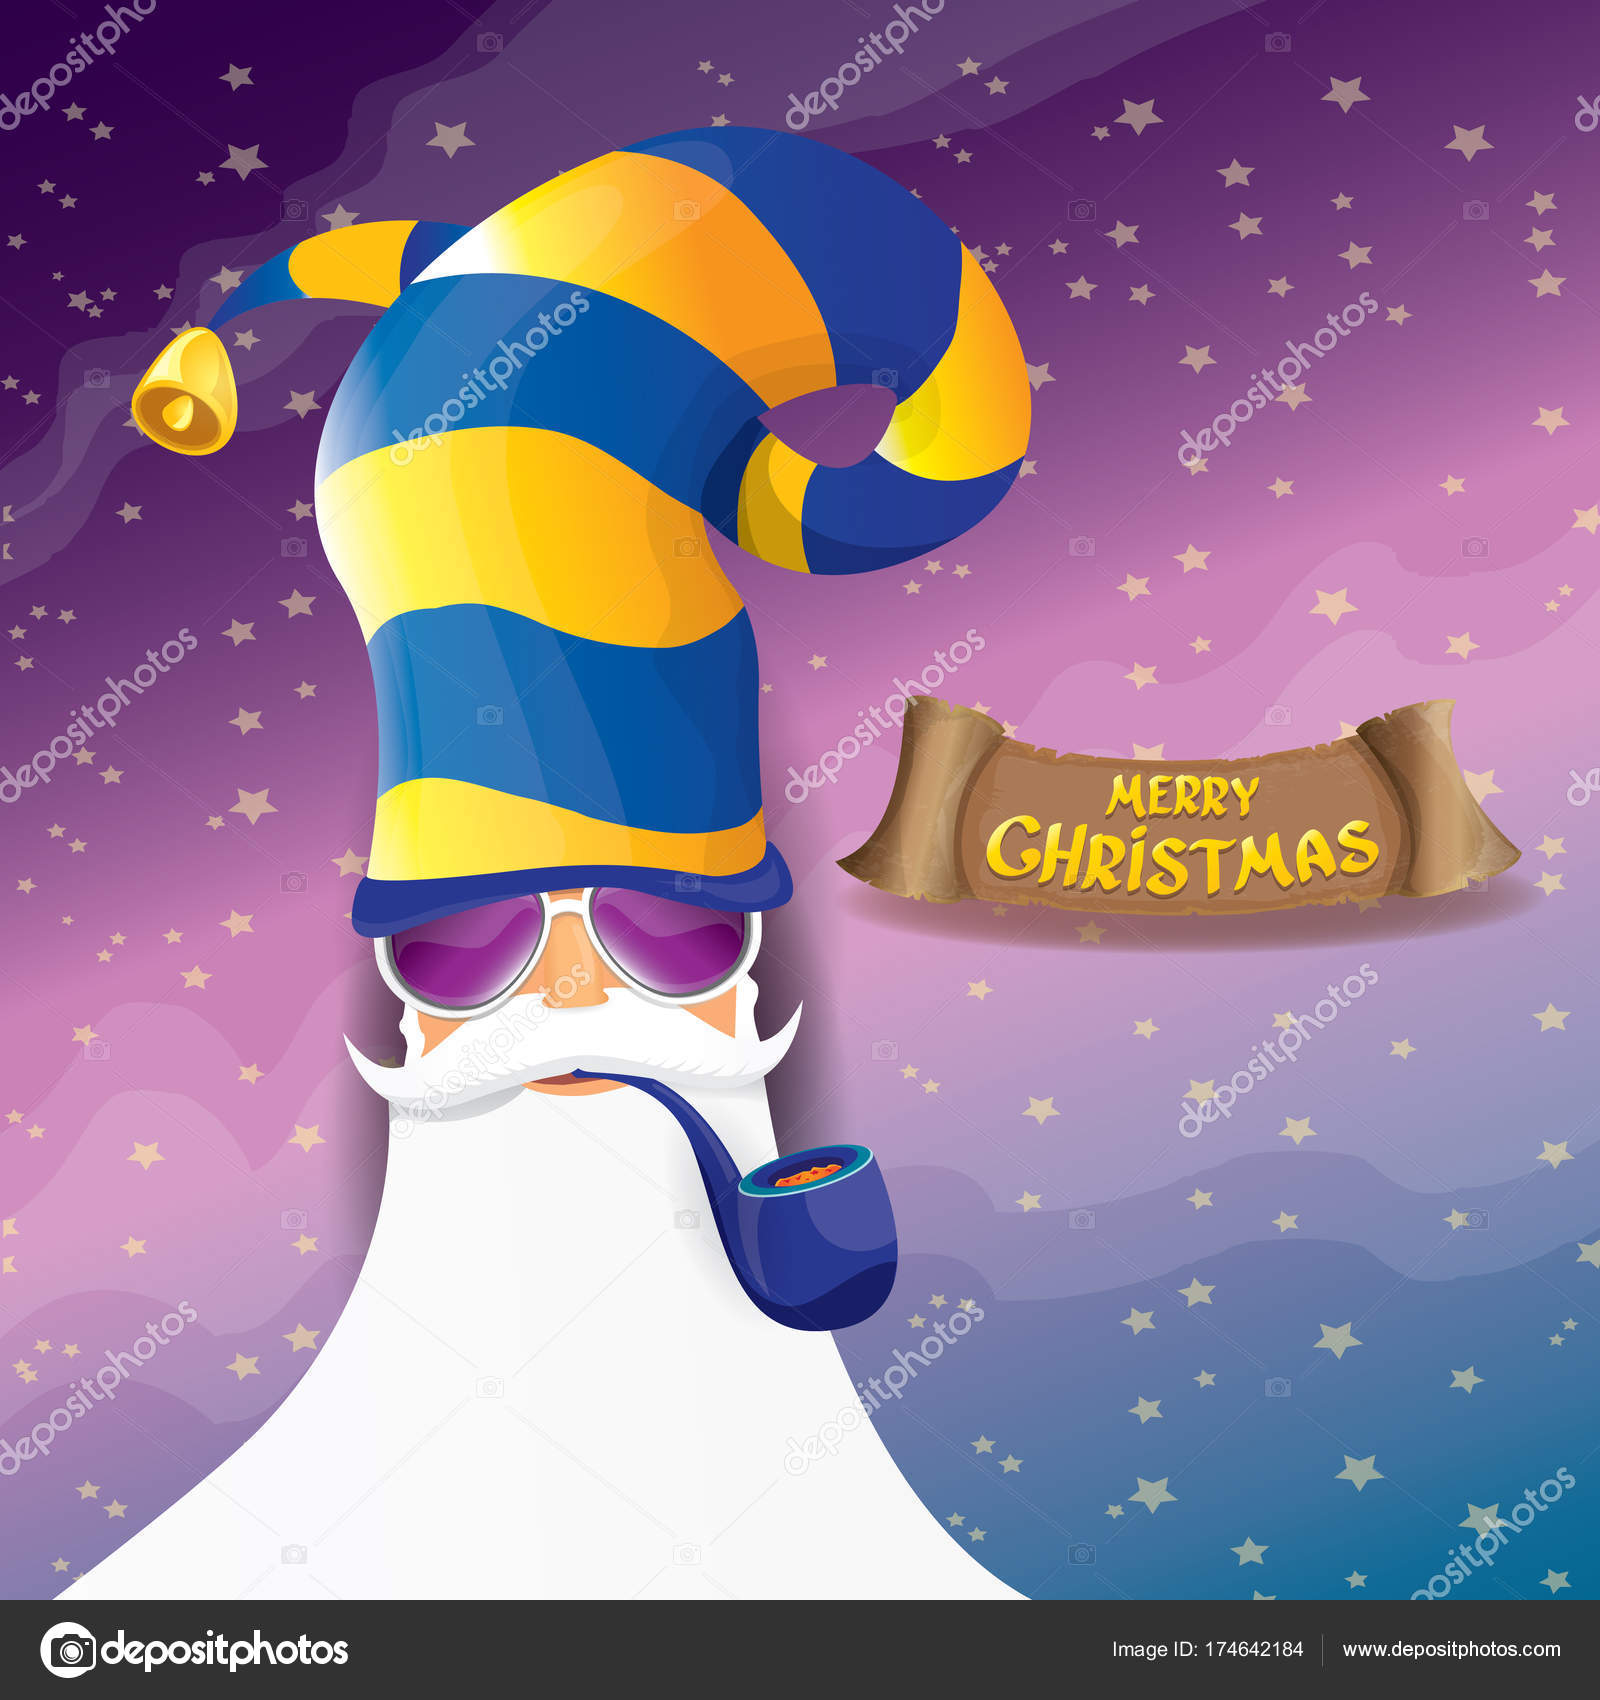 Vektor Rock \' n roll Santa Claus mit Pfeife, funky Bart und ...